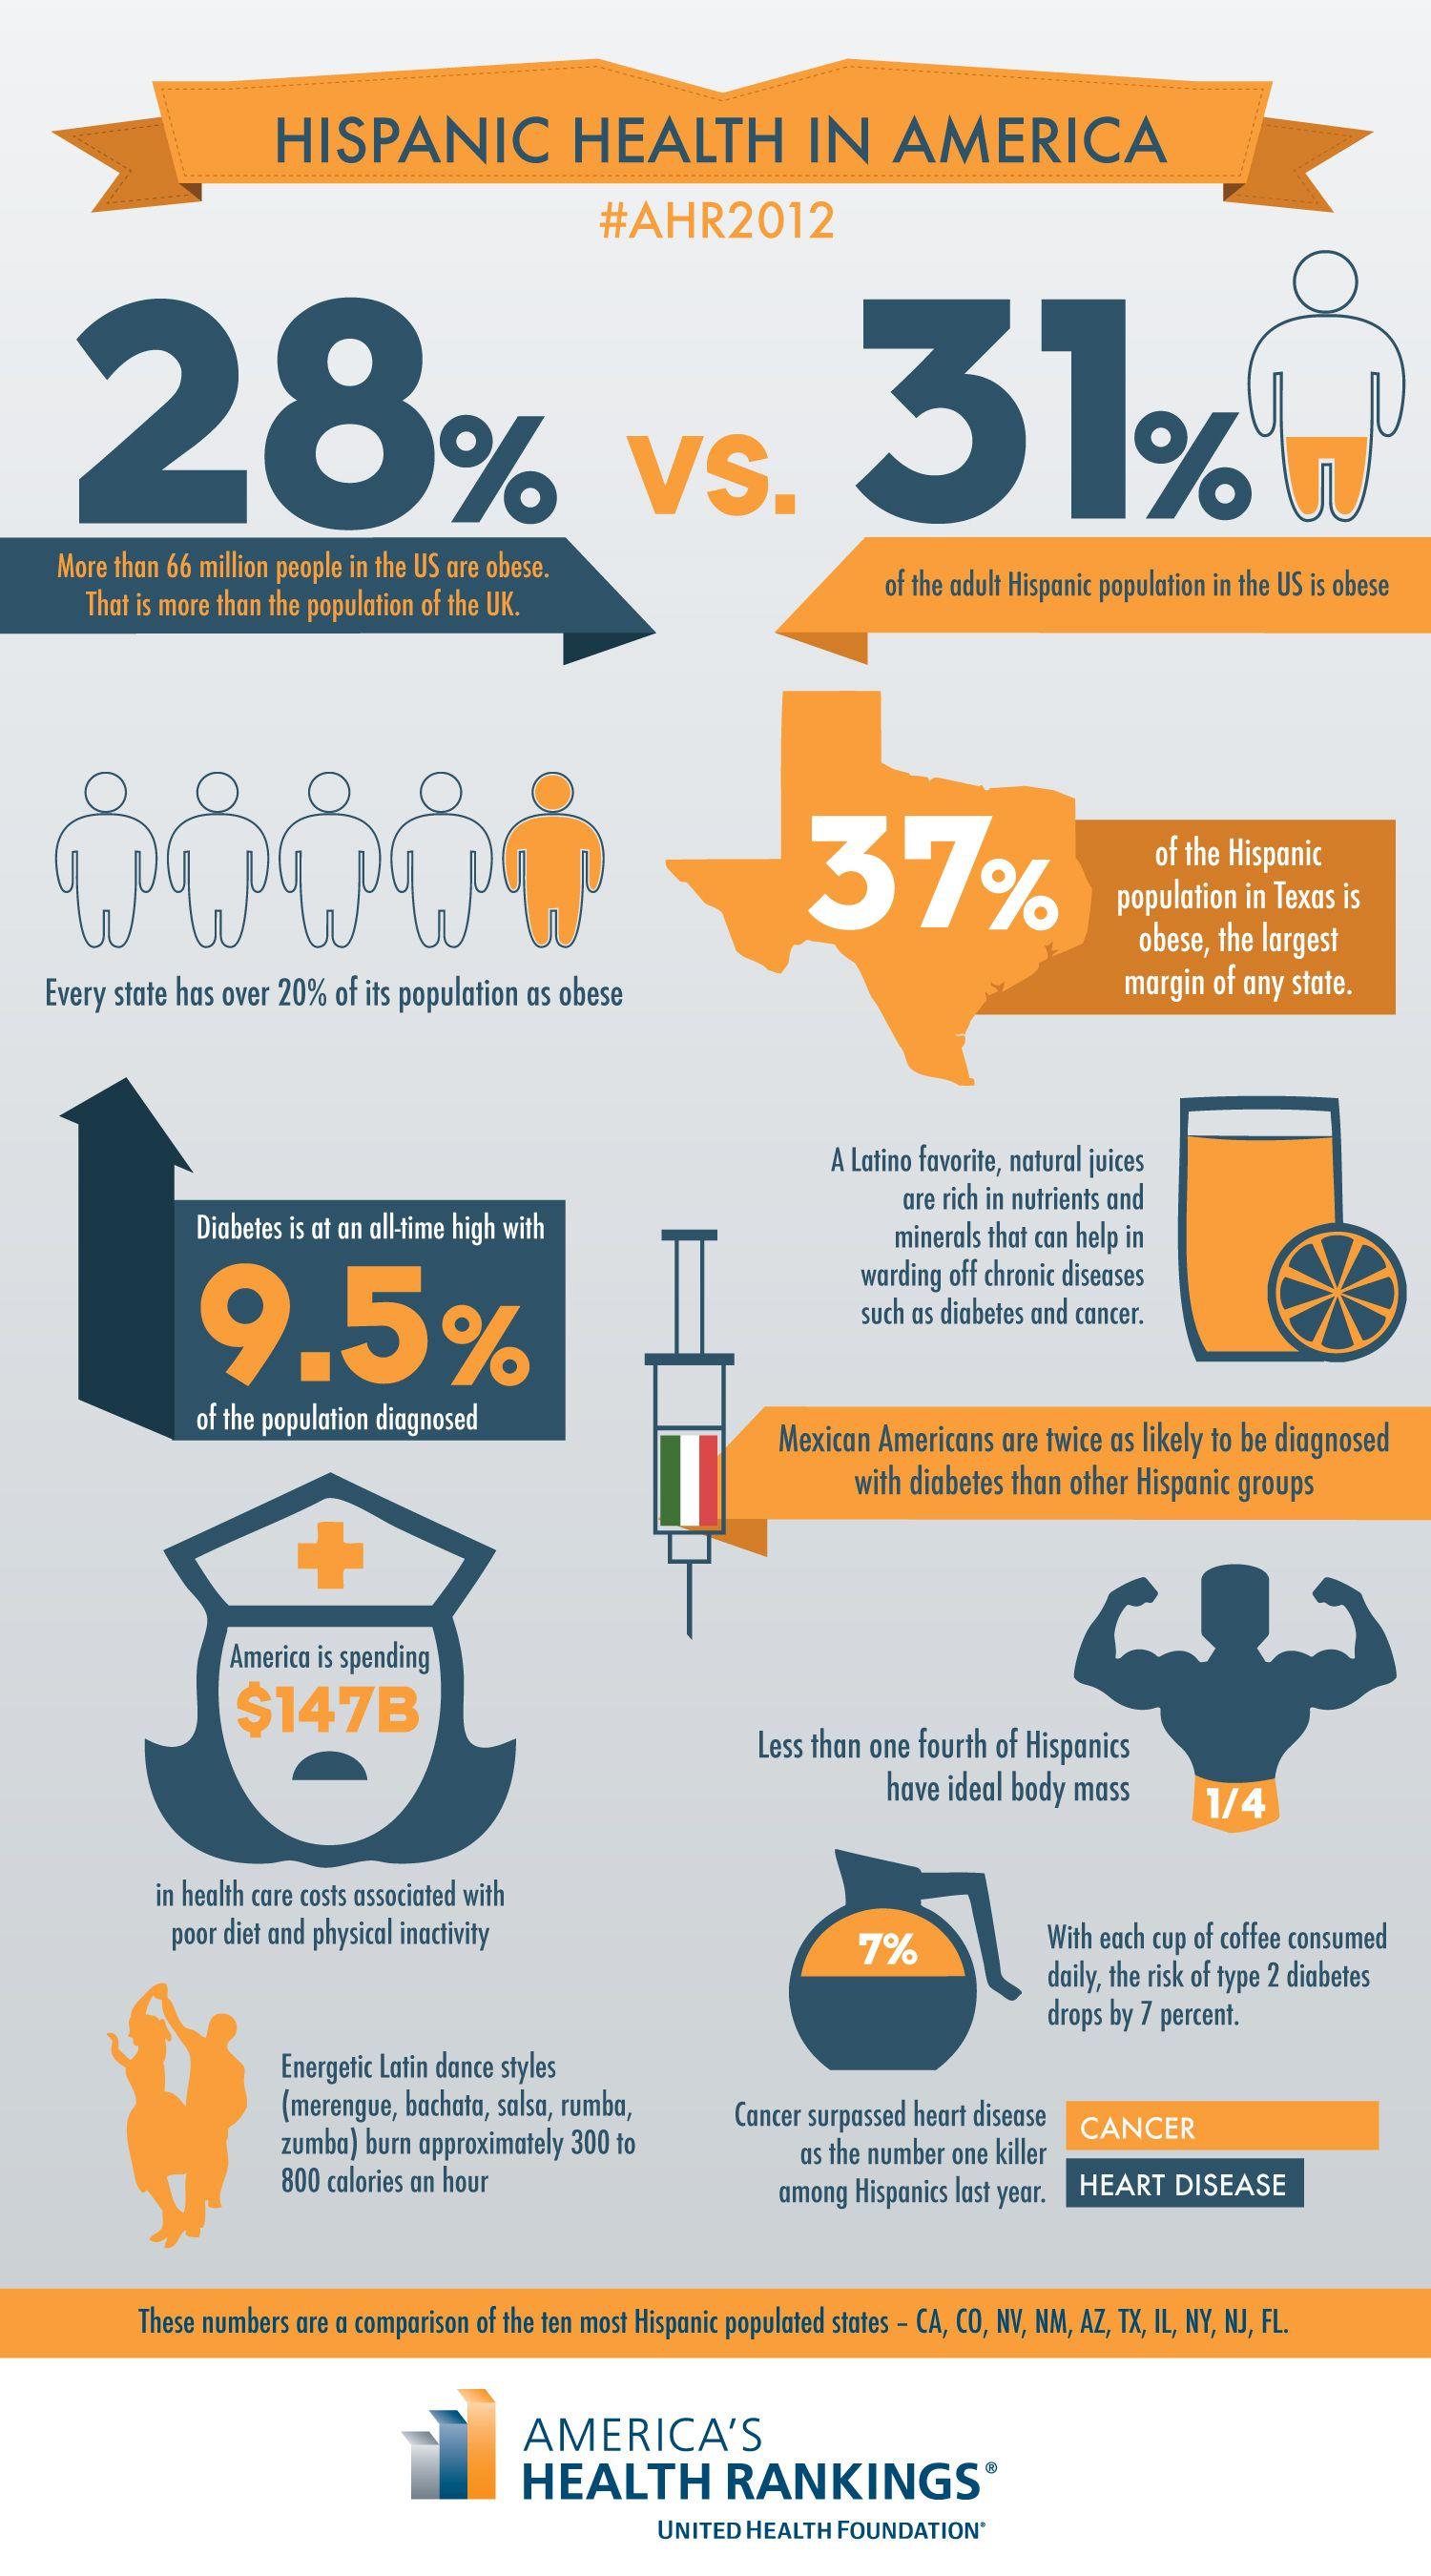 This graphic describes Hispanics health in America. It